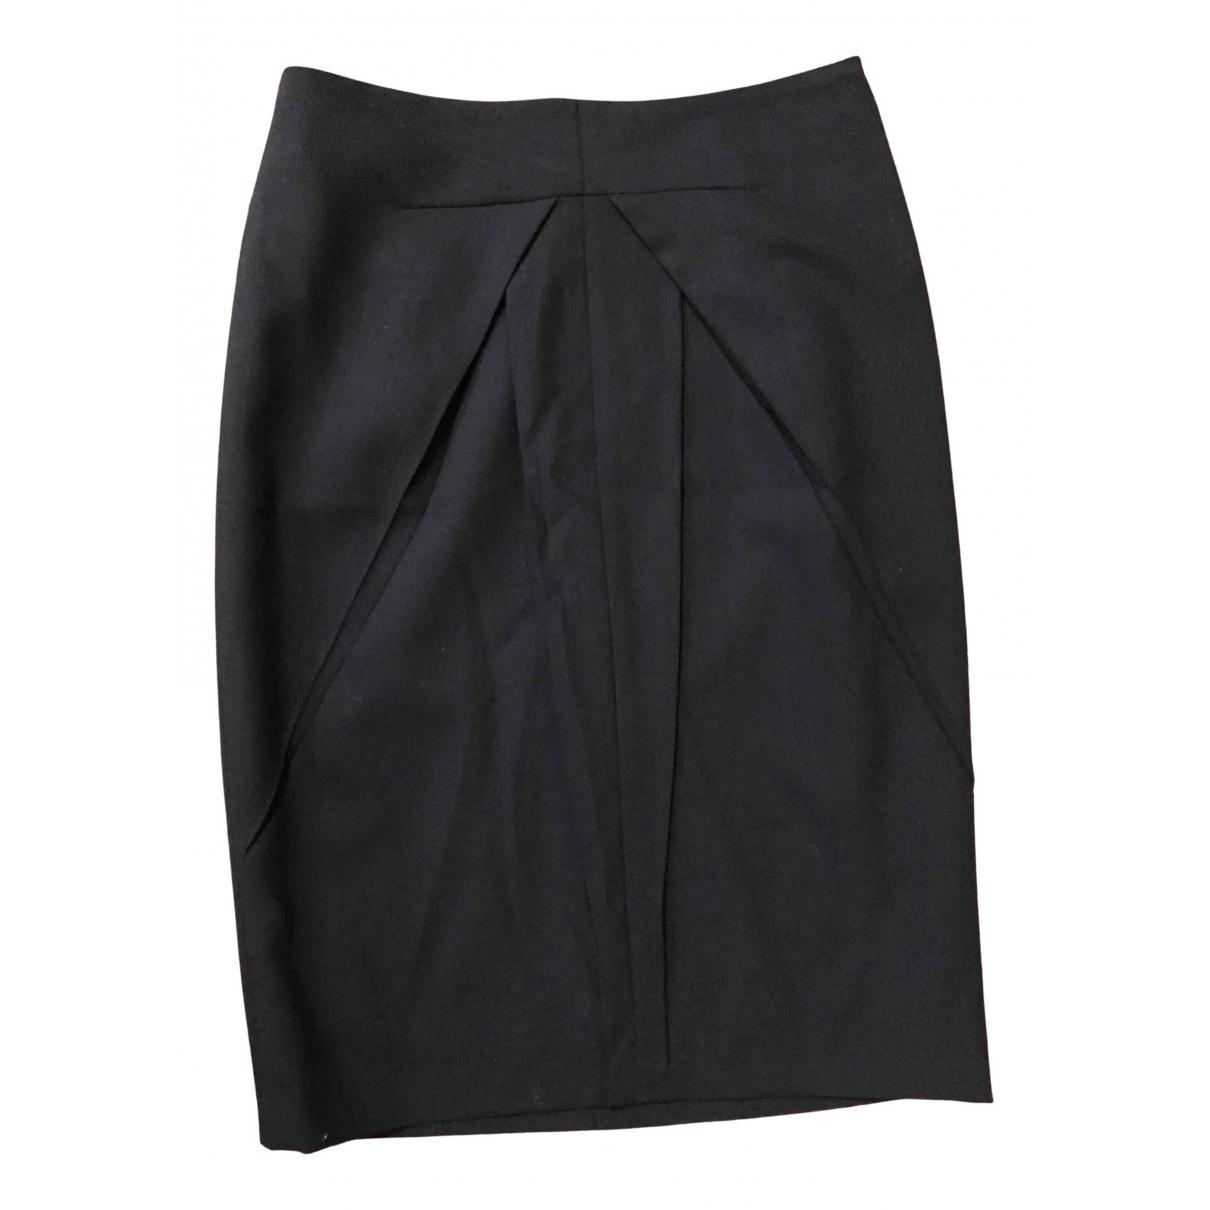 Viktor & Rolf - Jupe   pour femme en laine - noir